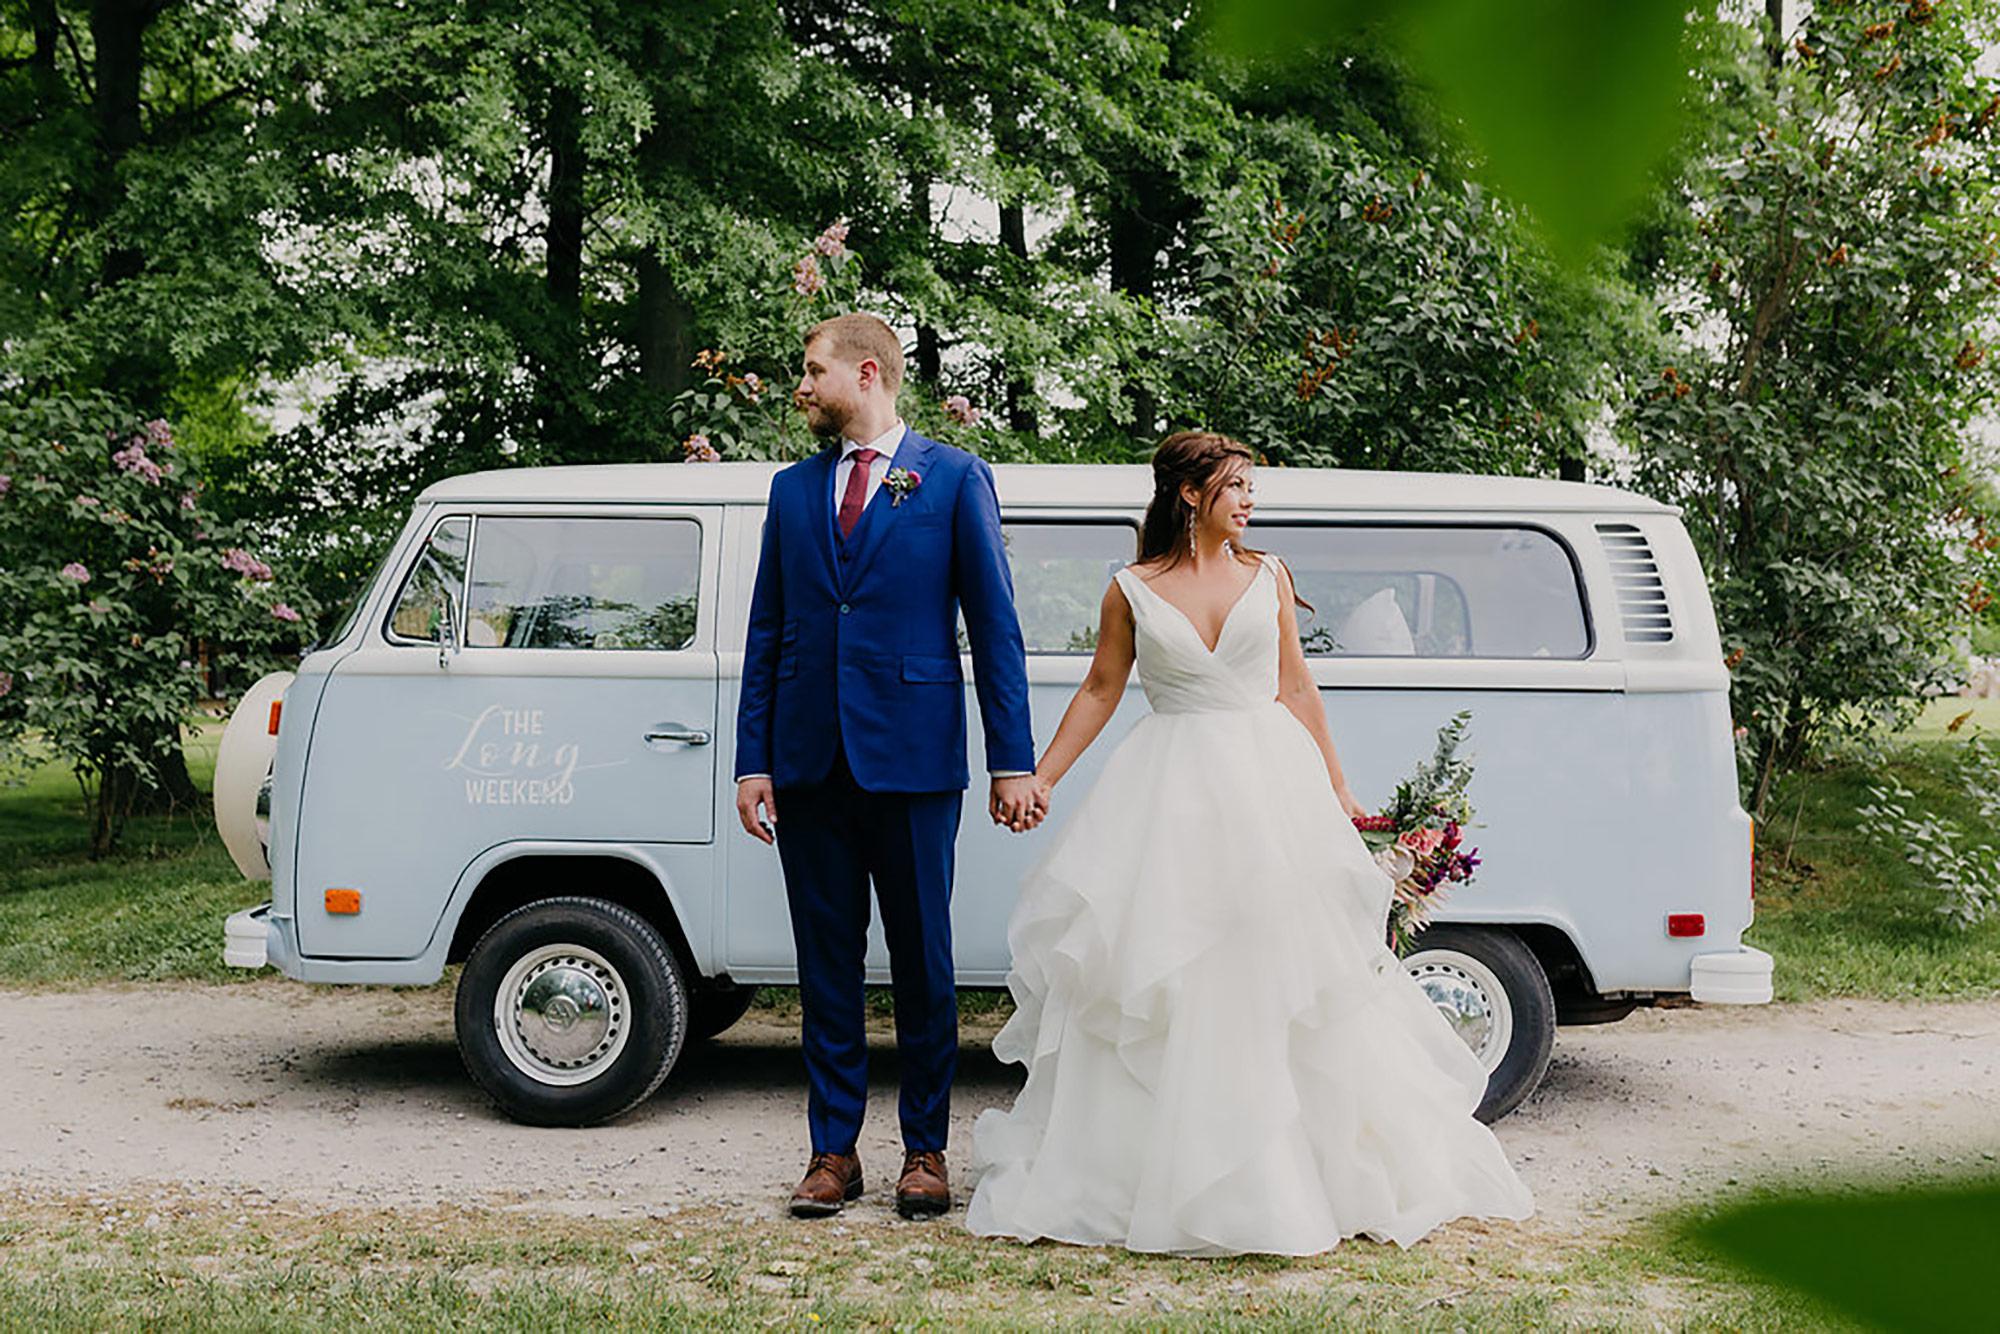 Kurtz-Orchards-Wedding-Niagara-wedding-Vineyard-Bride-Photography-by-Kayla-Rocca-020.JPG